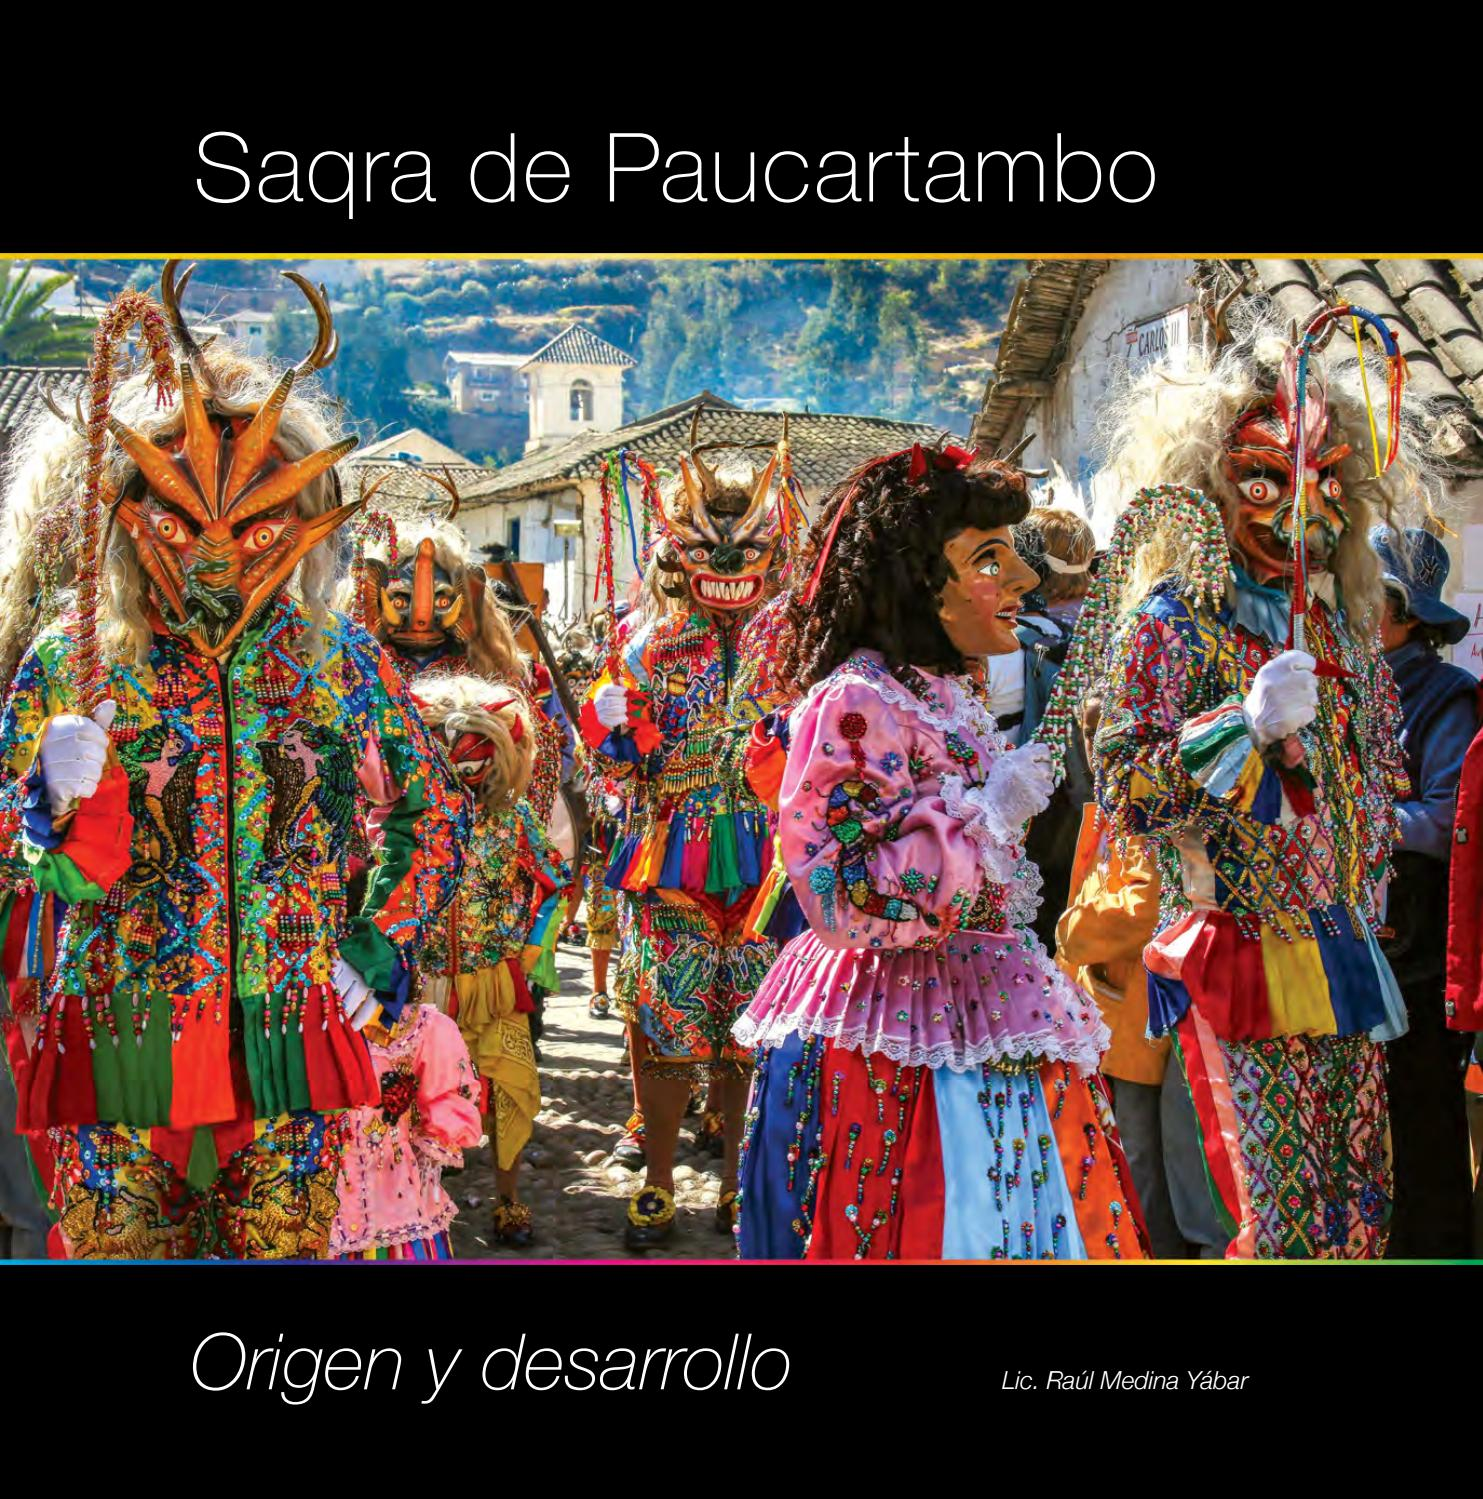 Saqra de Paucartambo by Raul Medina Yabar - issuu